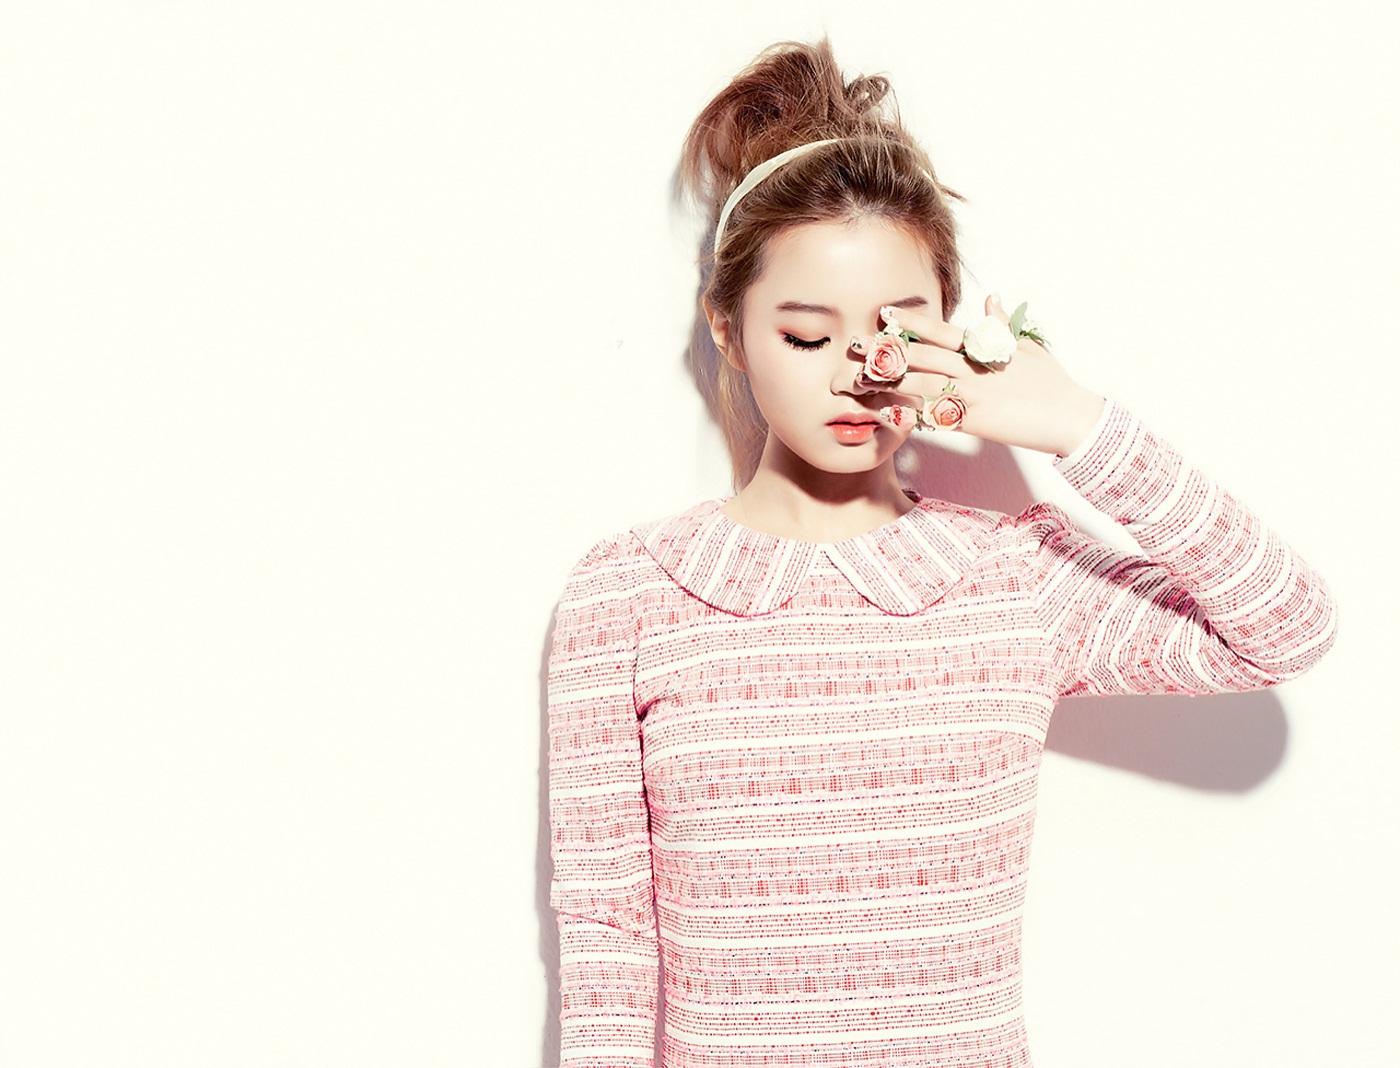 http://1.bp.blogspot.com/-MWZuWlDBoDM/UT80iMYDMxI/AAAAAAAAgfo/3JPxZyljYQY/s1600/Lee+Hi+First+Love+Wallpaper+7.jpg